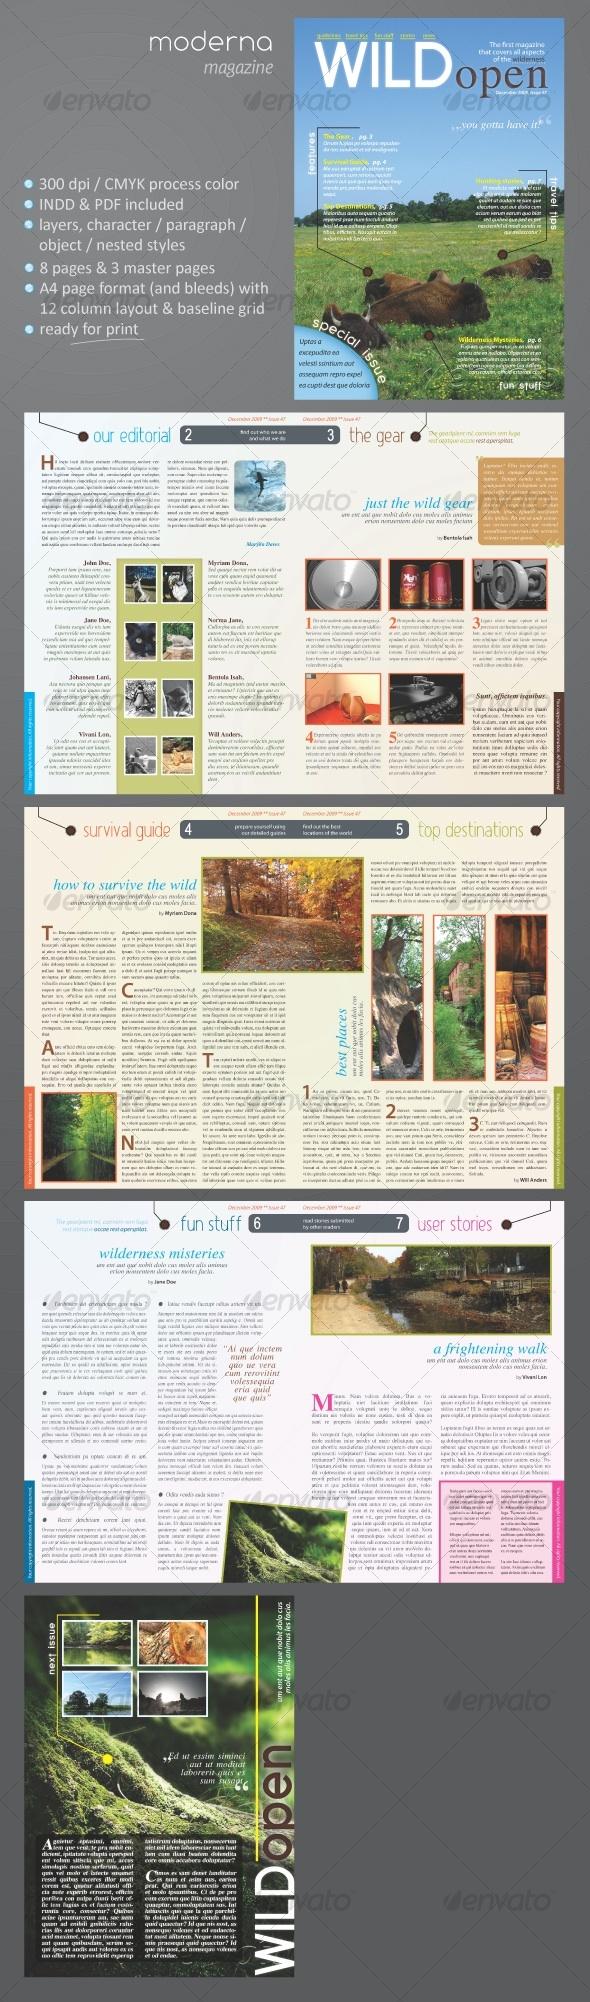 GraphicRiver Moderna Magazine 78124